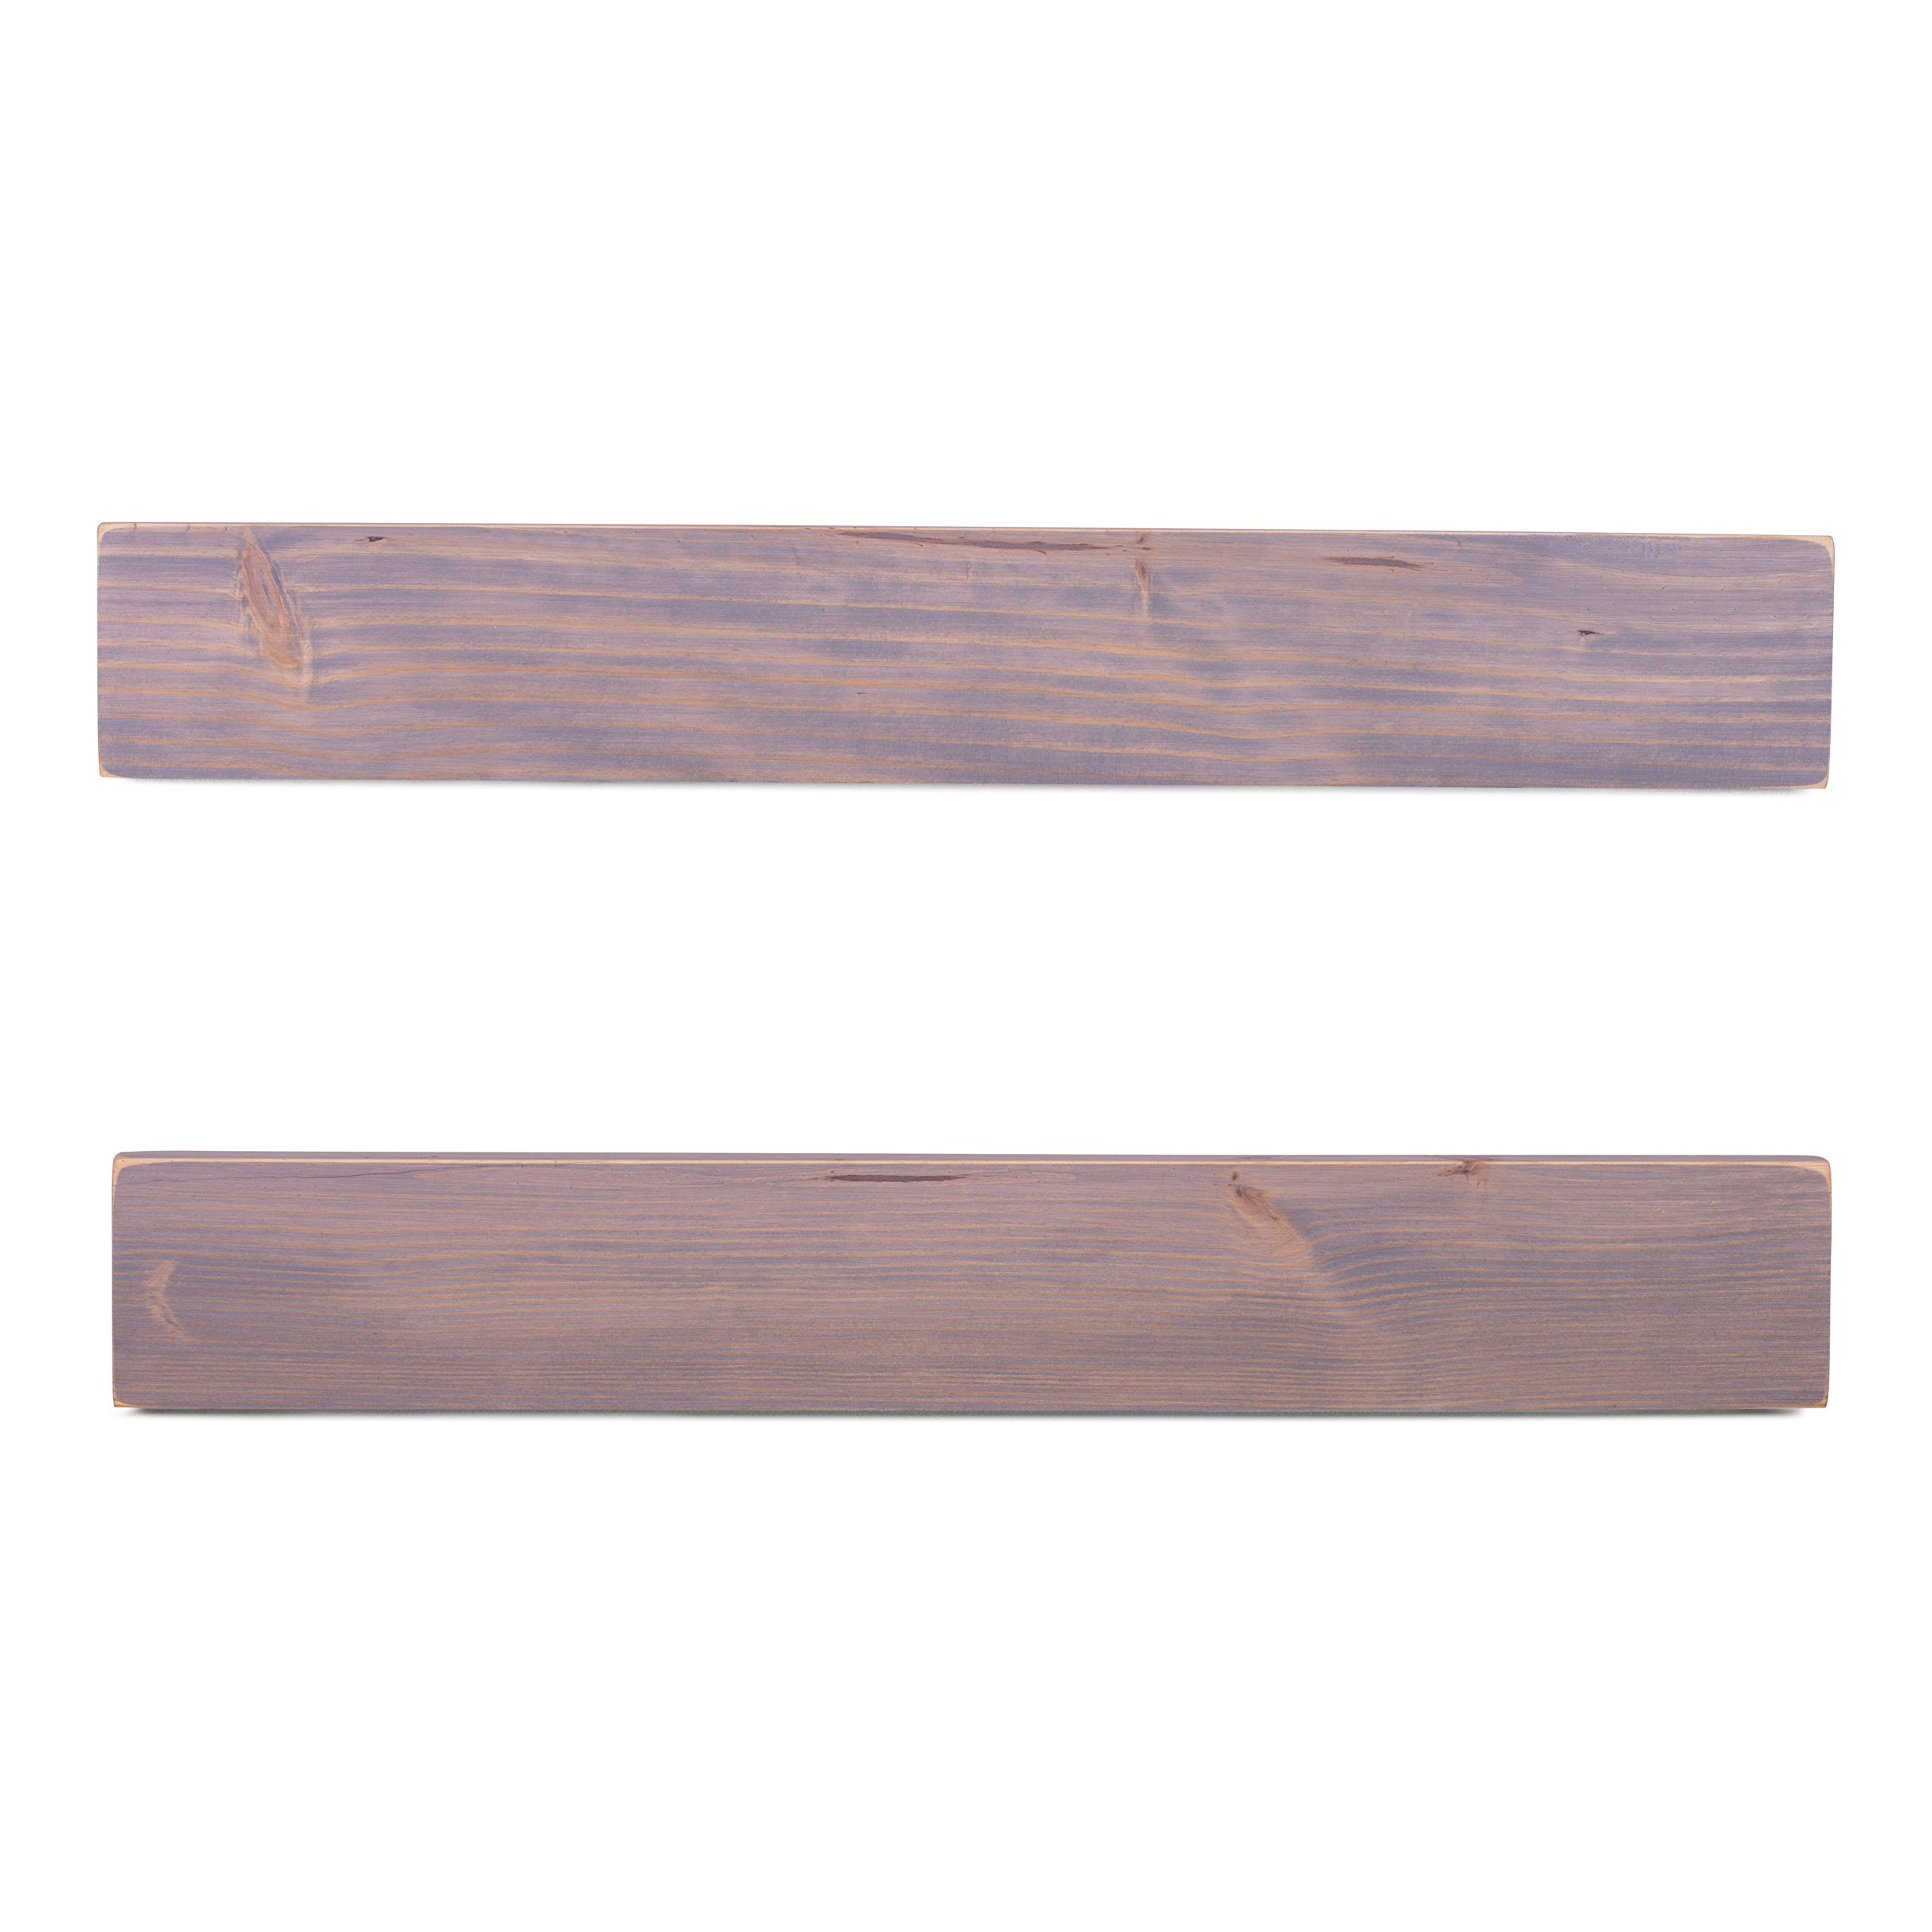 DAKODA LOVE 5.25'' Deep Weathered Edge Floating Shelves, USA Handmade, Clear Coat Finish, 100% Countersunk Hidden Floating Shelf Brackets, Beautiful Grain Pine Wood Rustic (Set of 2) (36'', Greige) by DAKODA LOVE (Image #4)